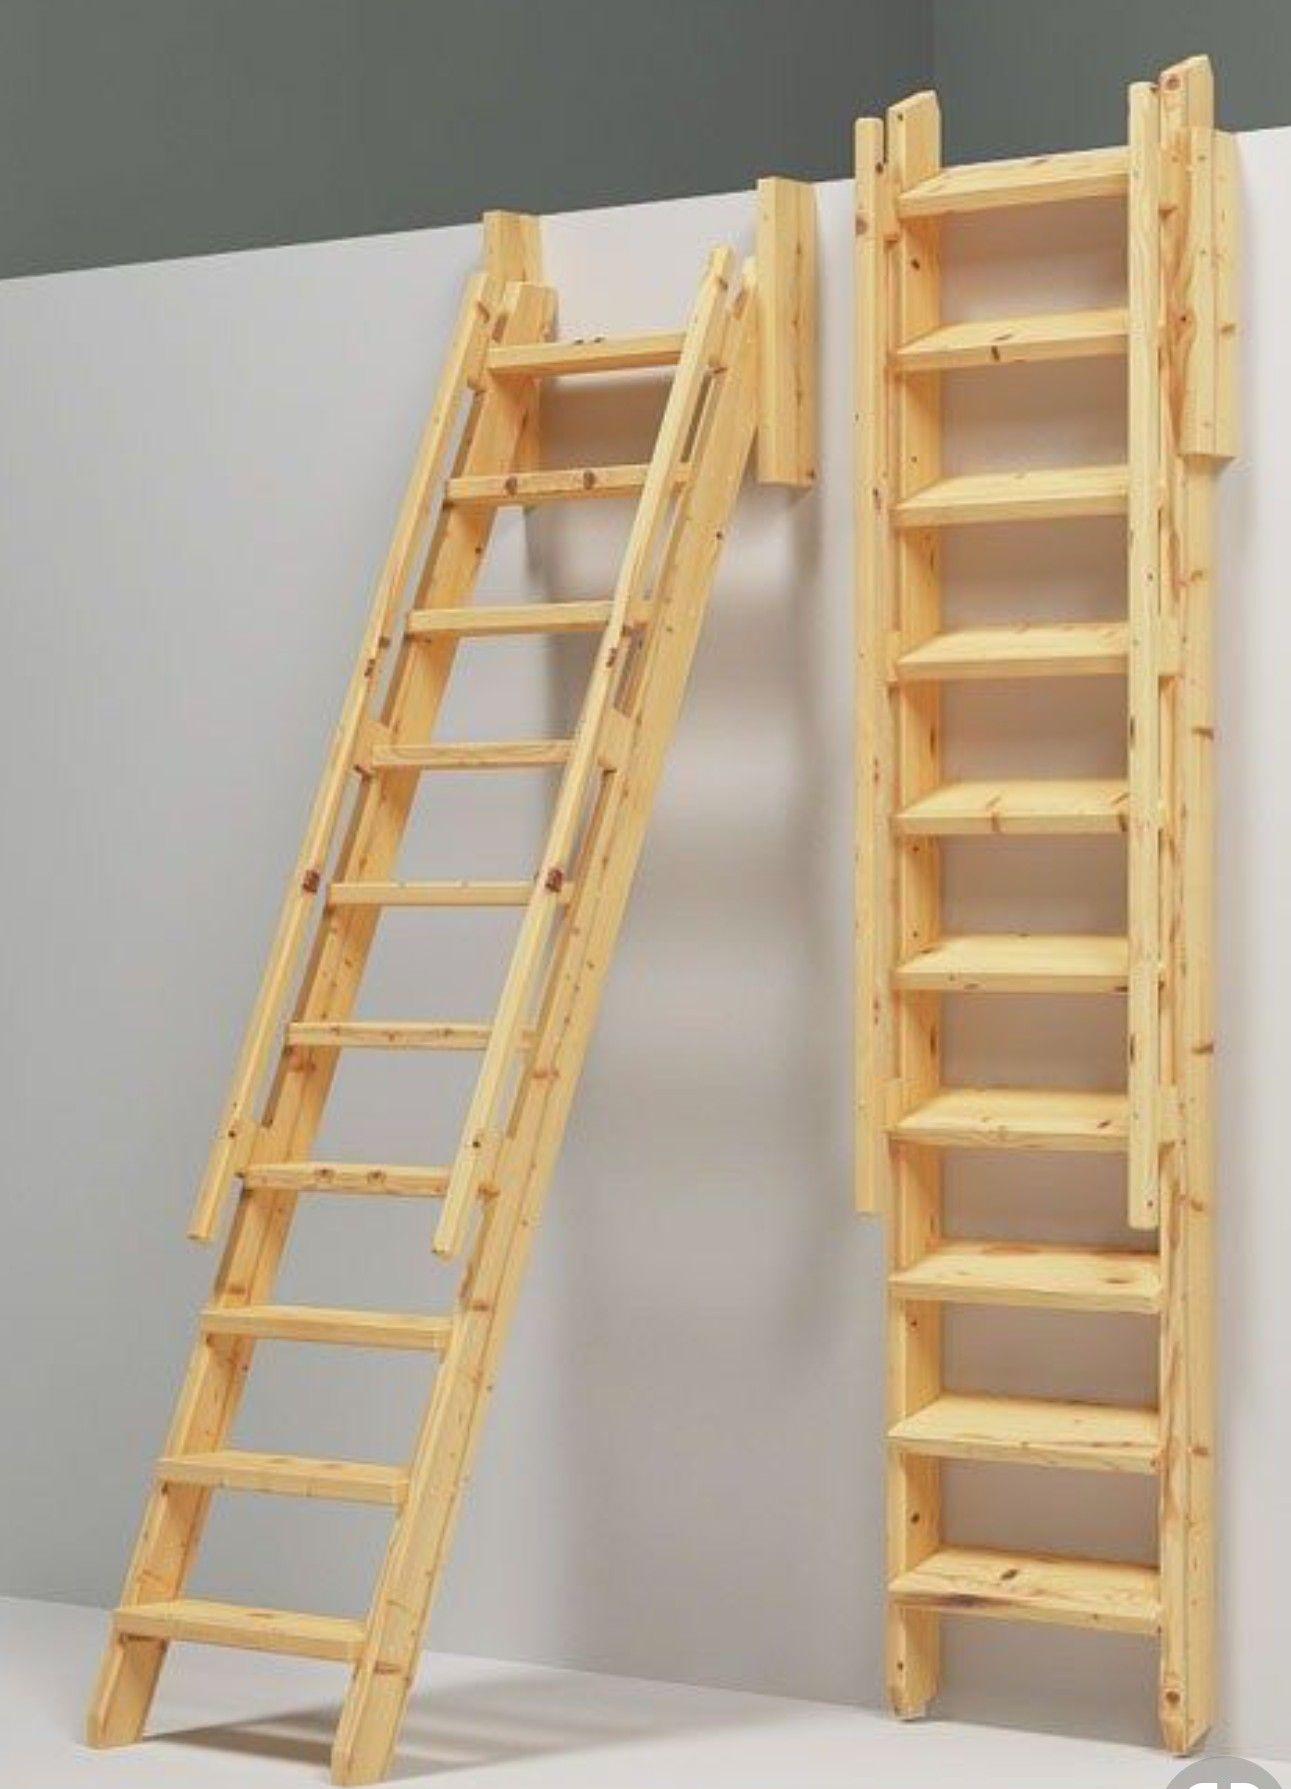 Custom Vintage Dog Tee Largest Online Dog Boutique Loft Ladder Tiny House Stairs Tiny House Loft